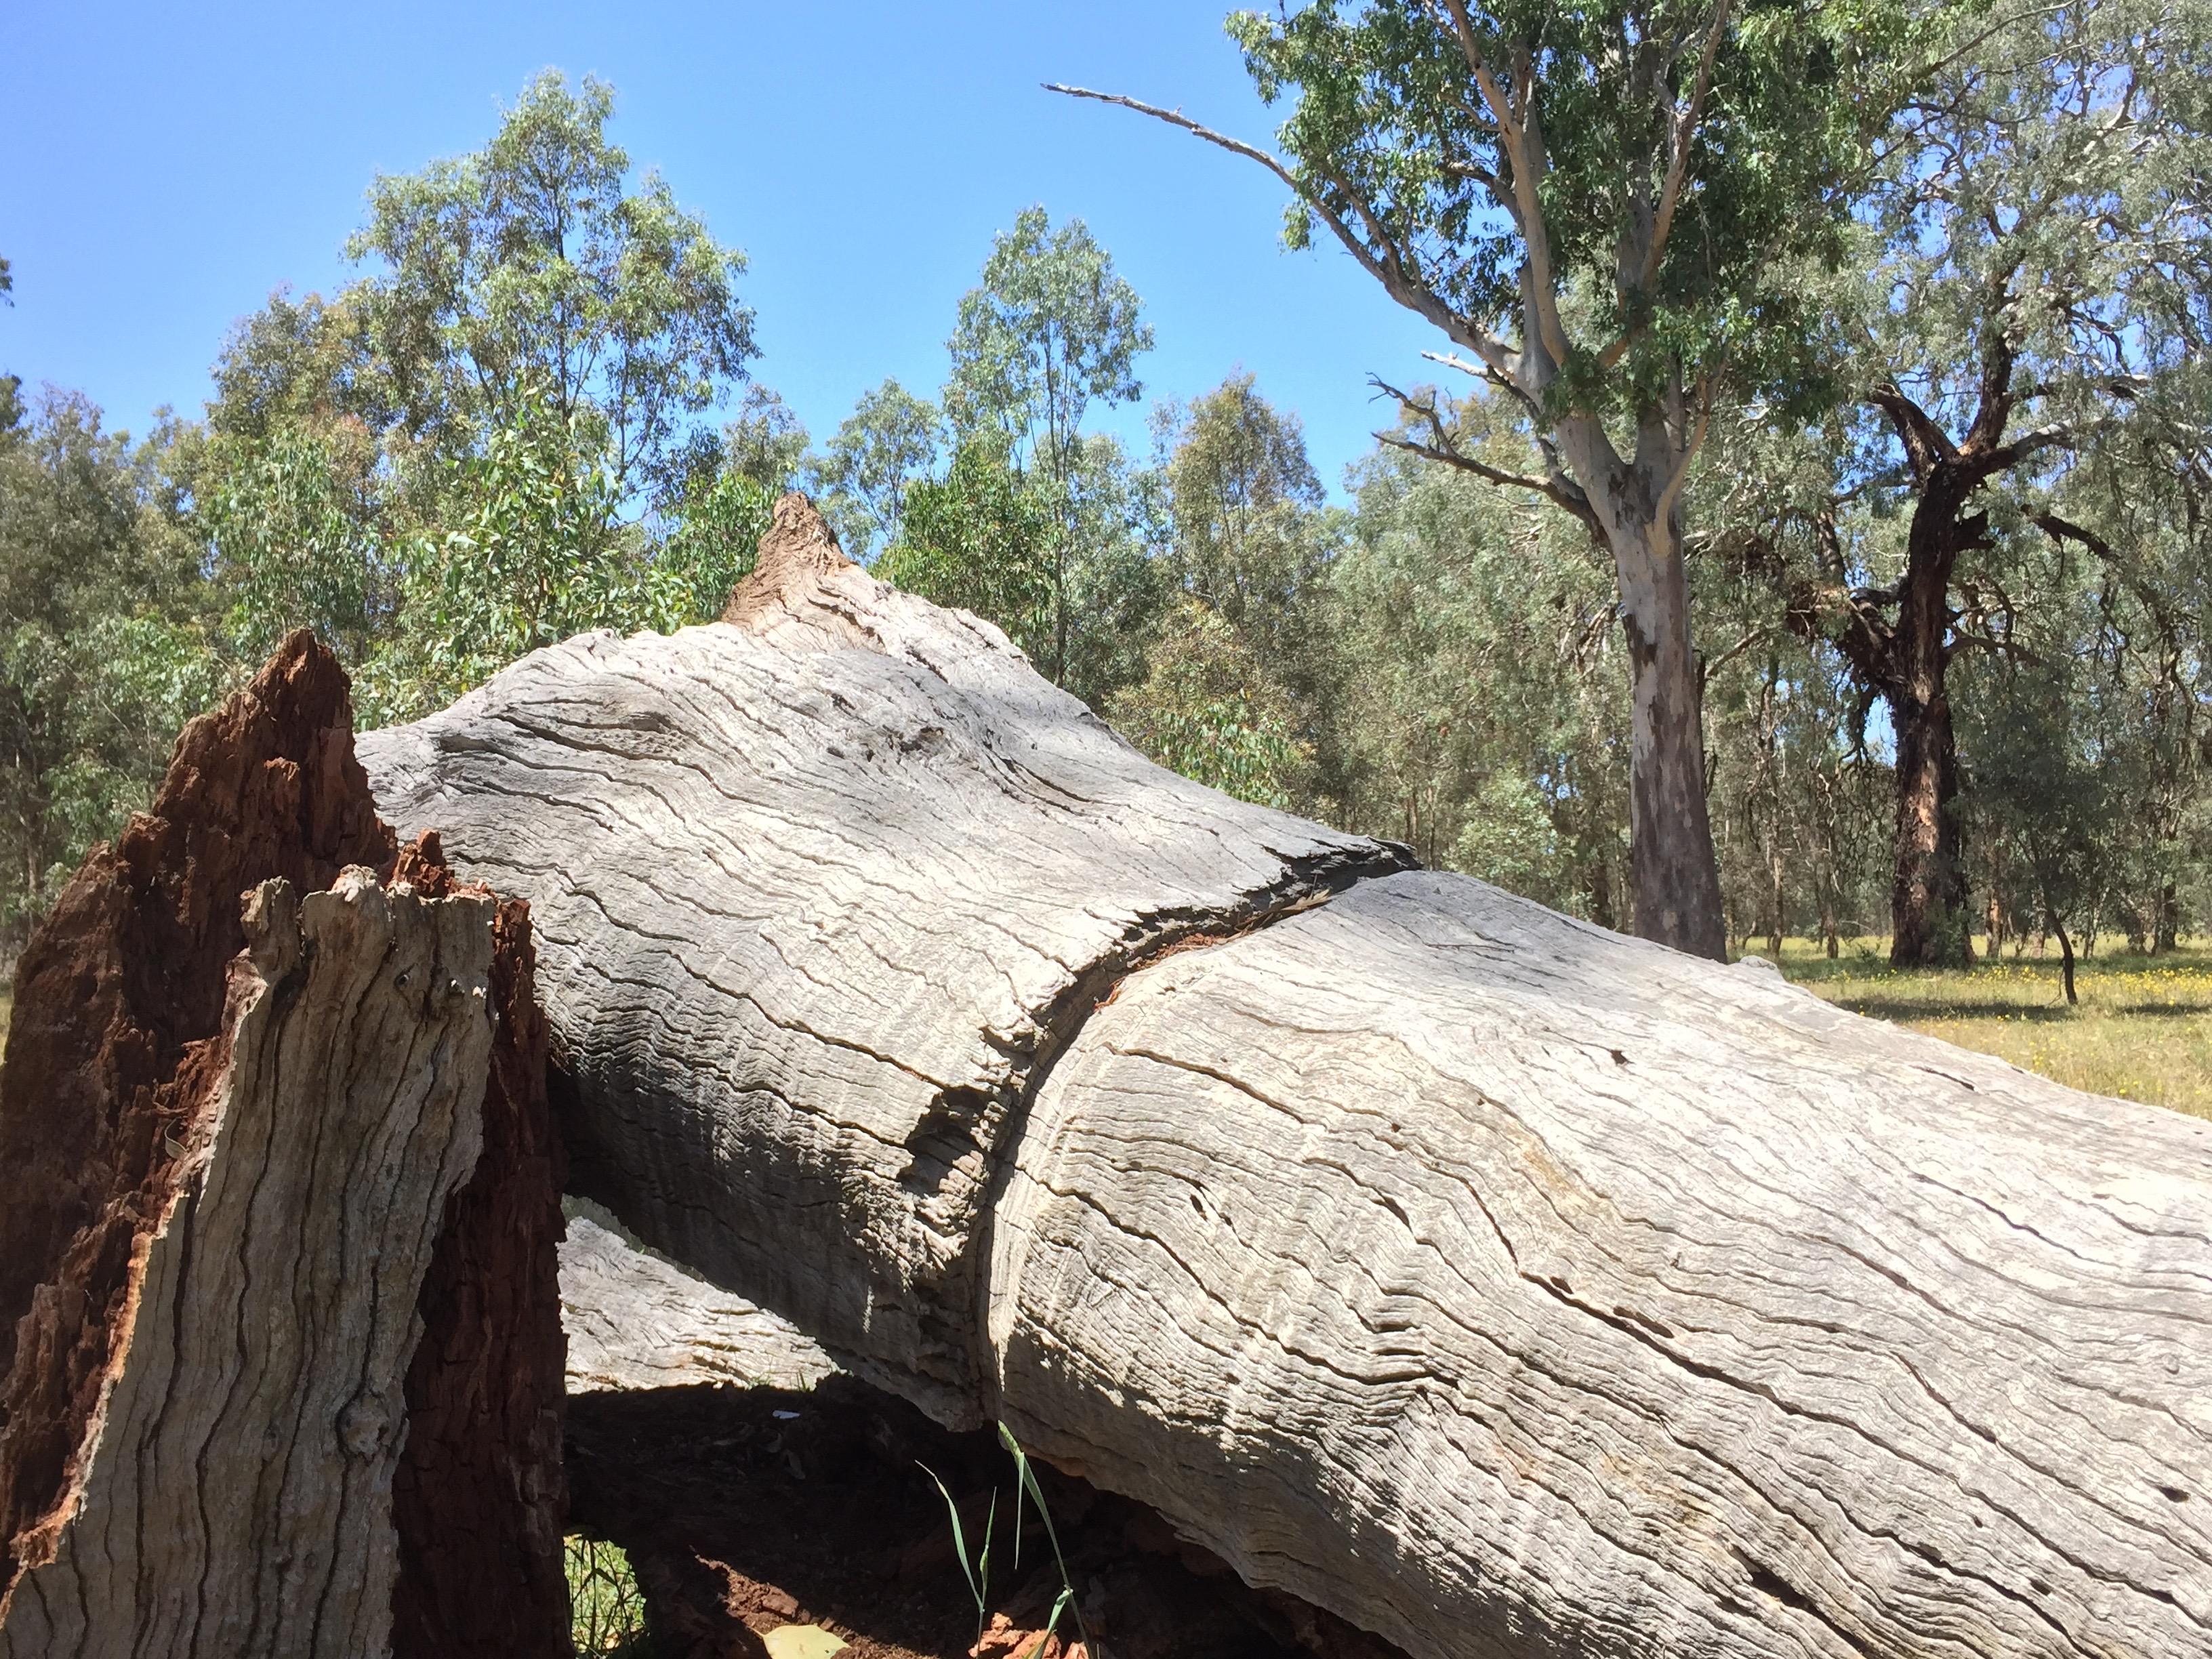 Ringbarked large tree at Bell's TSR, Thurgoona NSW